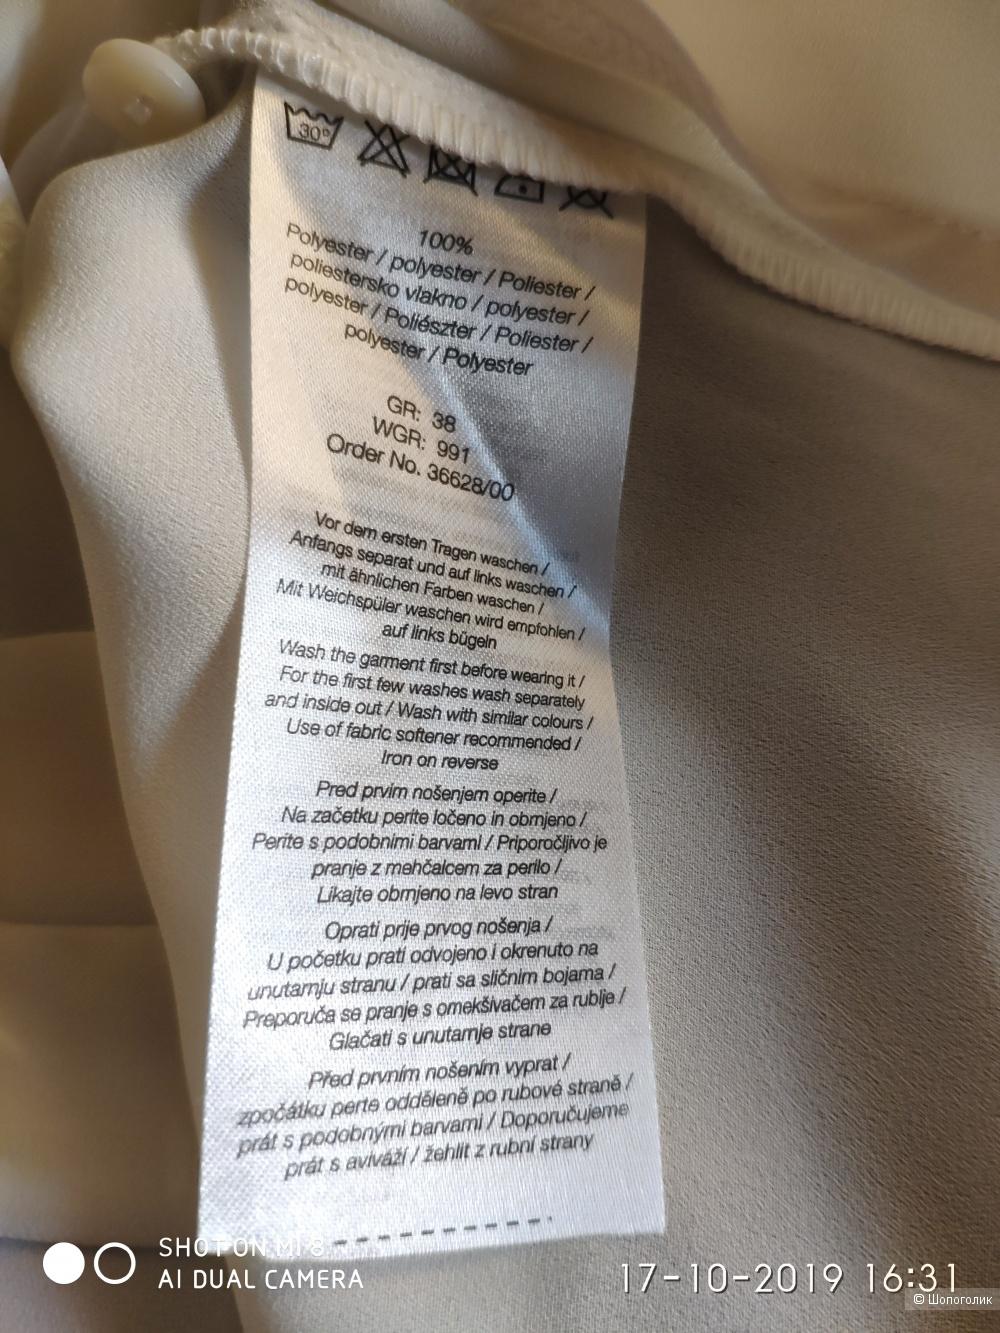 Блузка марки Janina размер 38 европейский, российский 44.